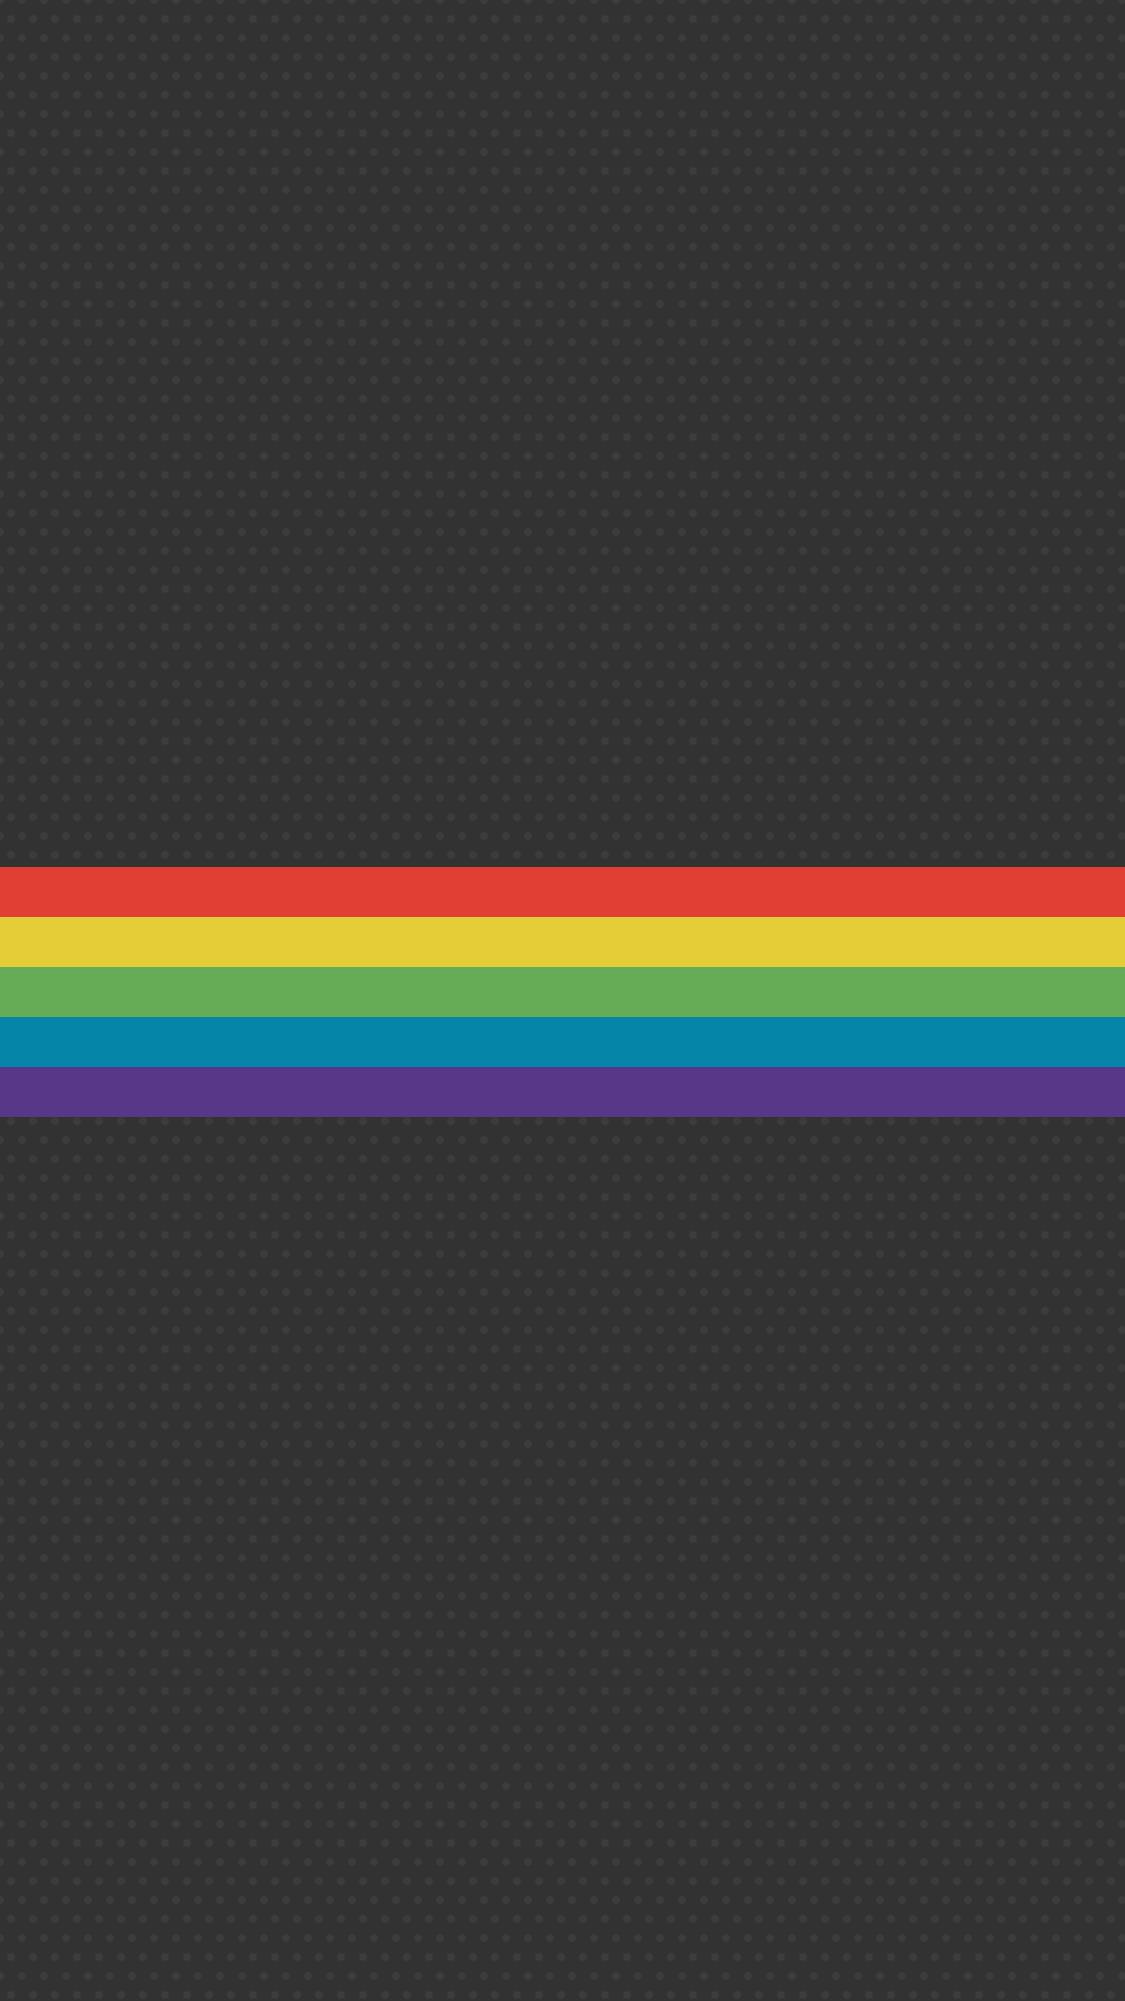 Pin By Cyn Thompson On Rainbow Wallpaper Rainbow Wallpaper Wallpaper Iphone Wallpaper